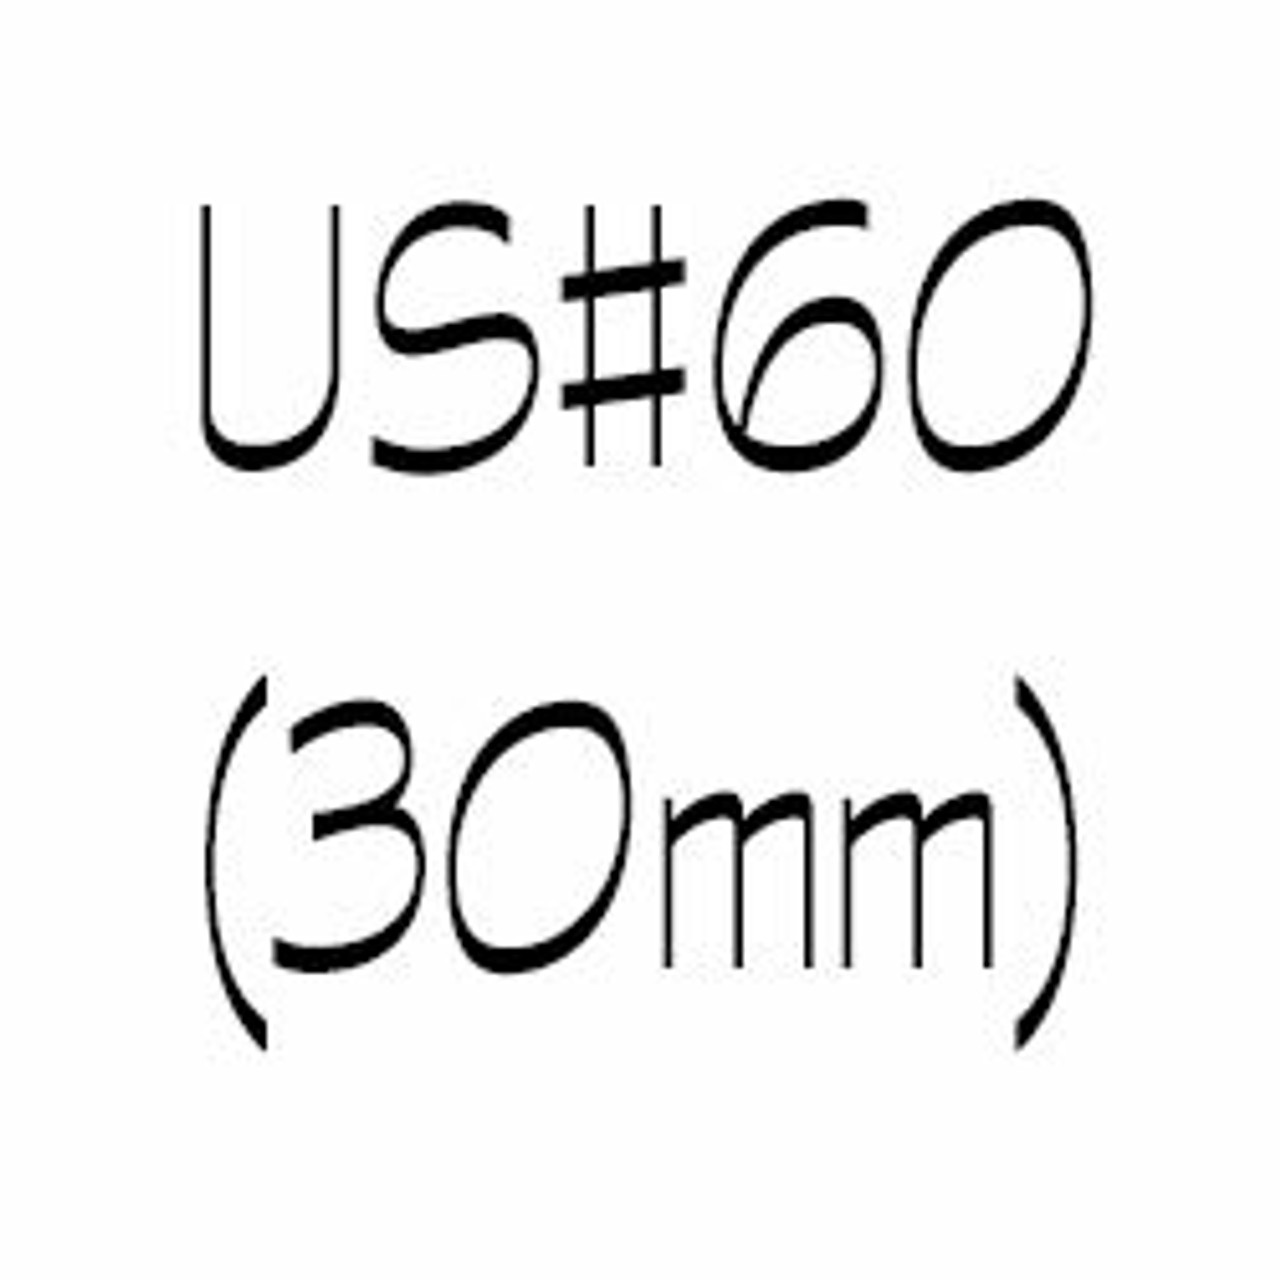 US#60 (30mm) Circular Knitting Needles